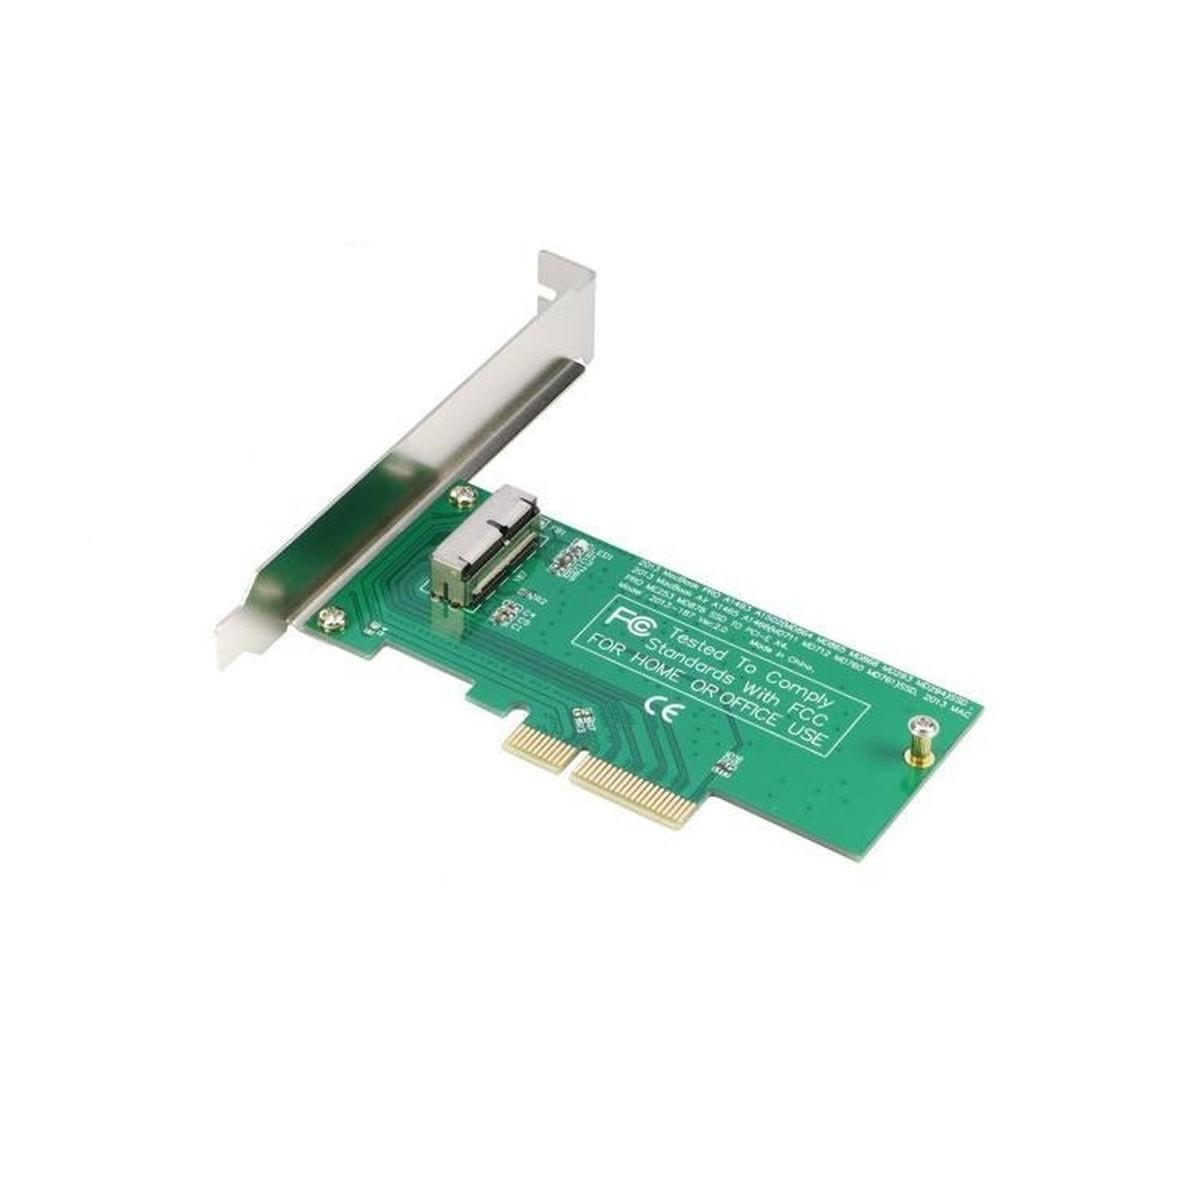 HP WRITE CACHE 512MB DDR2 DO P800 012698-002 GW+FV